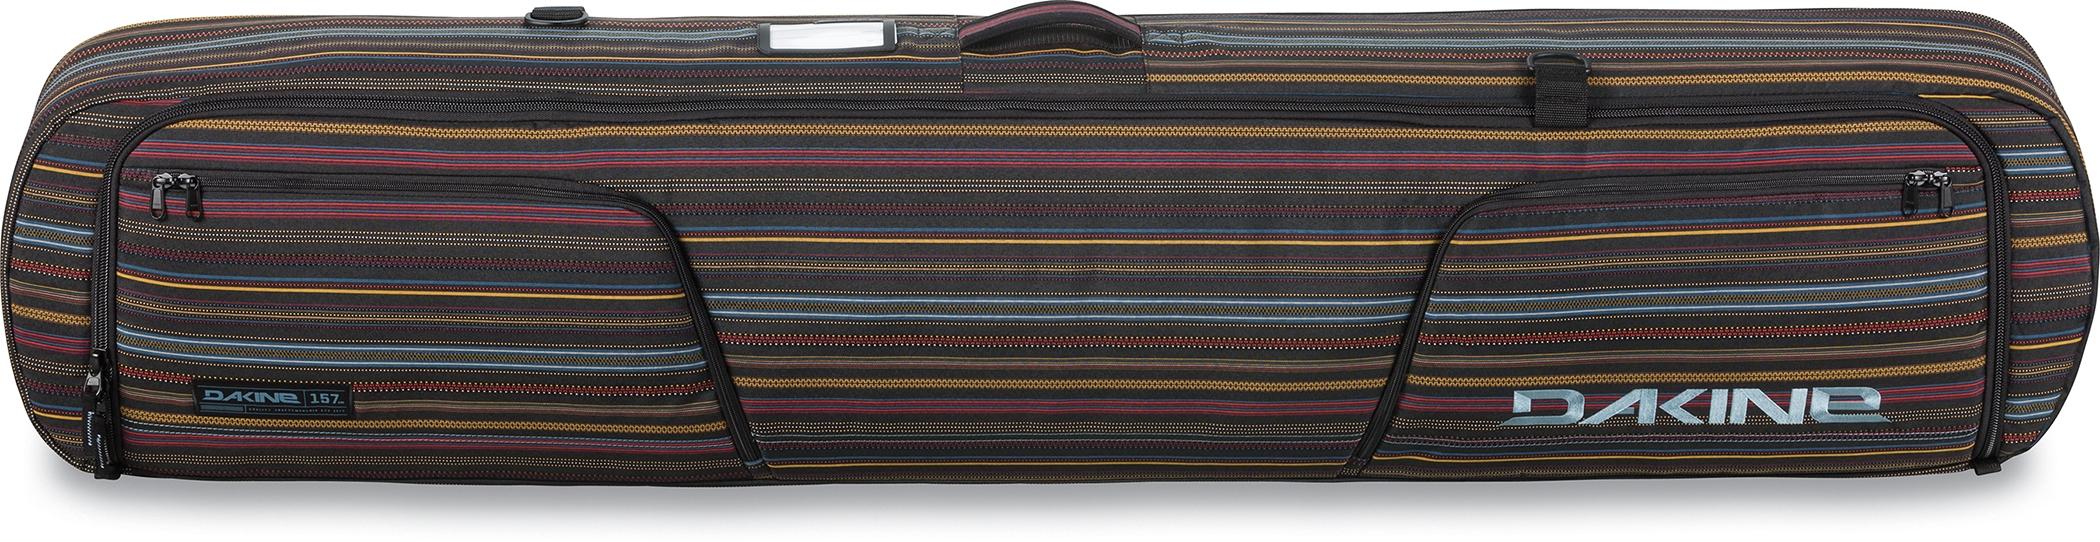 Dakine Tour Bag 157cm Nevada 30